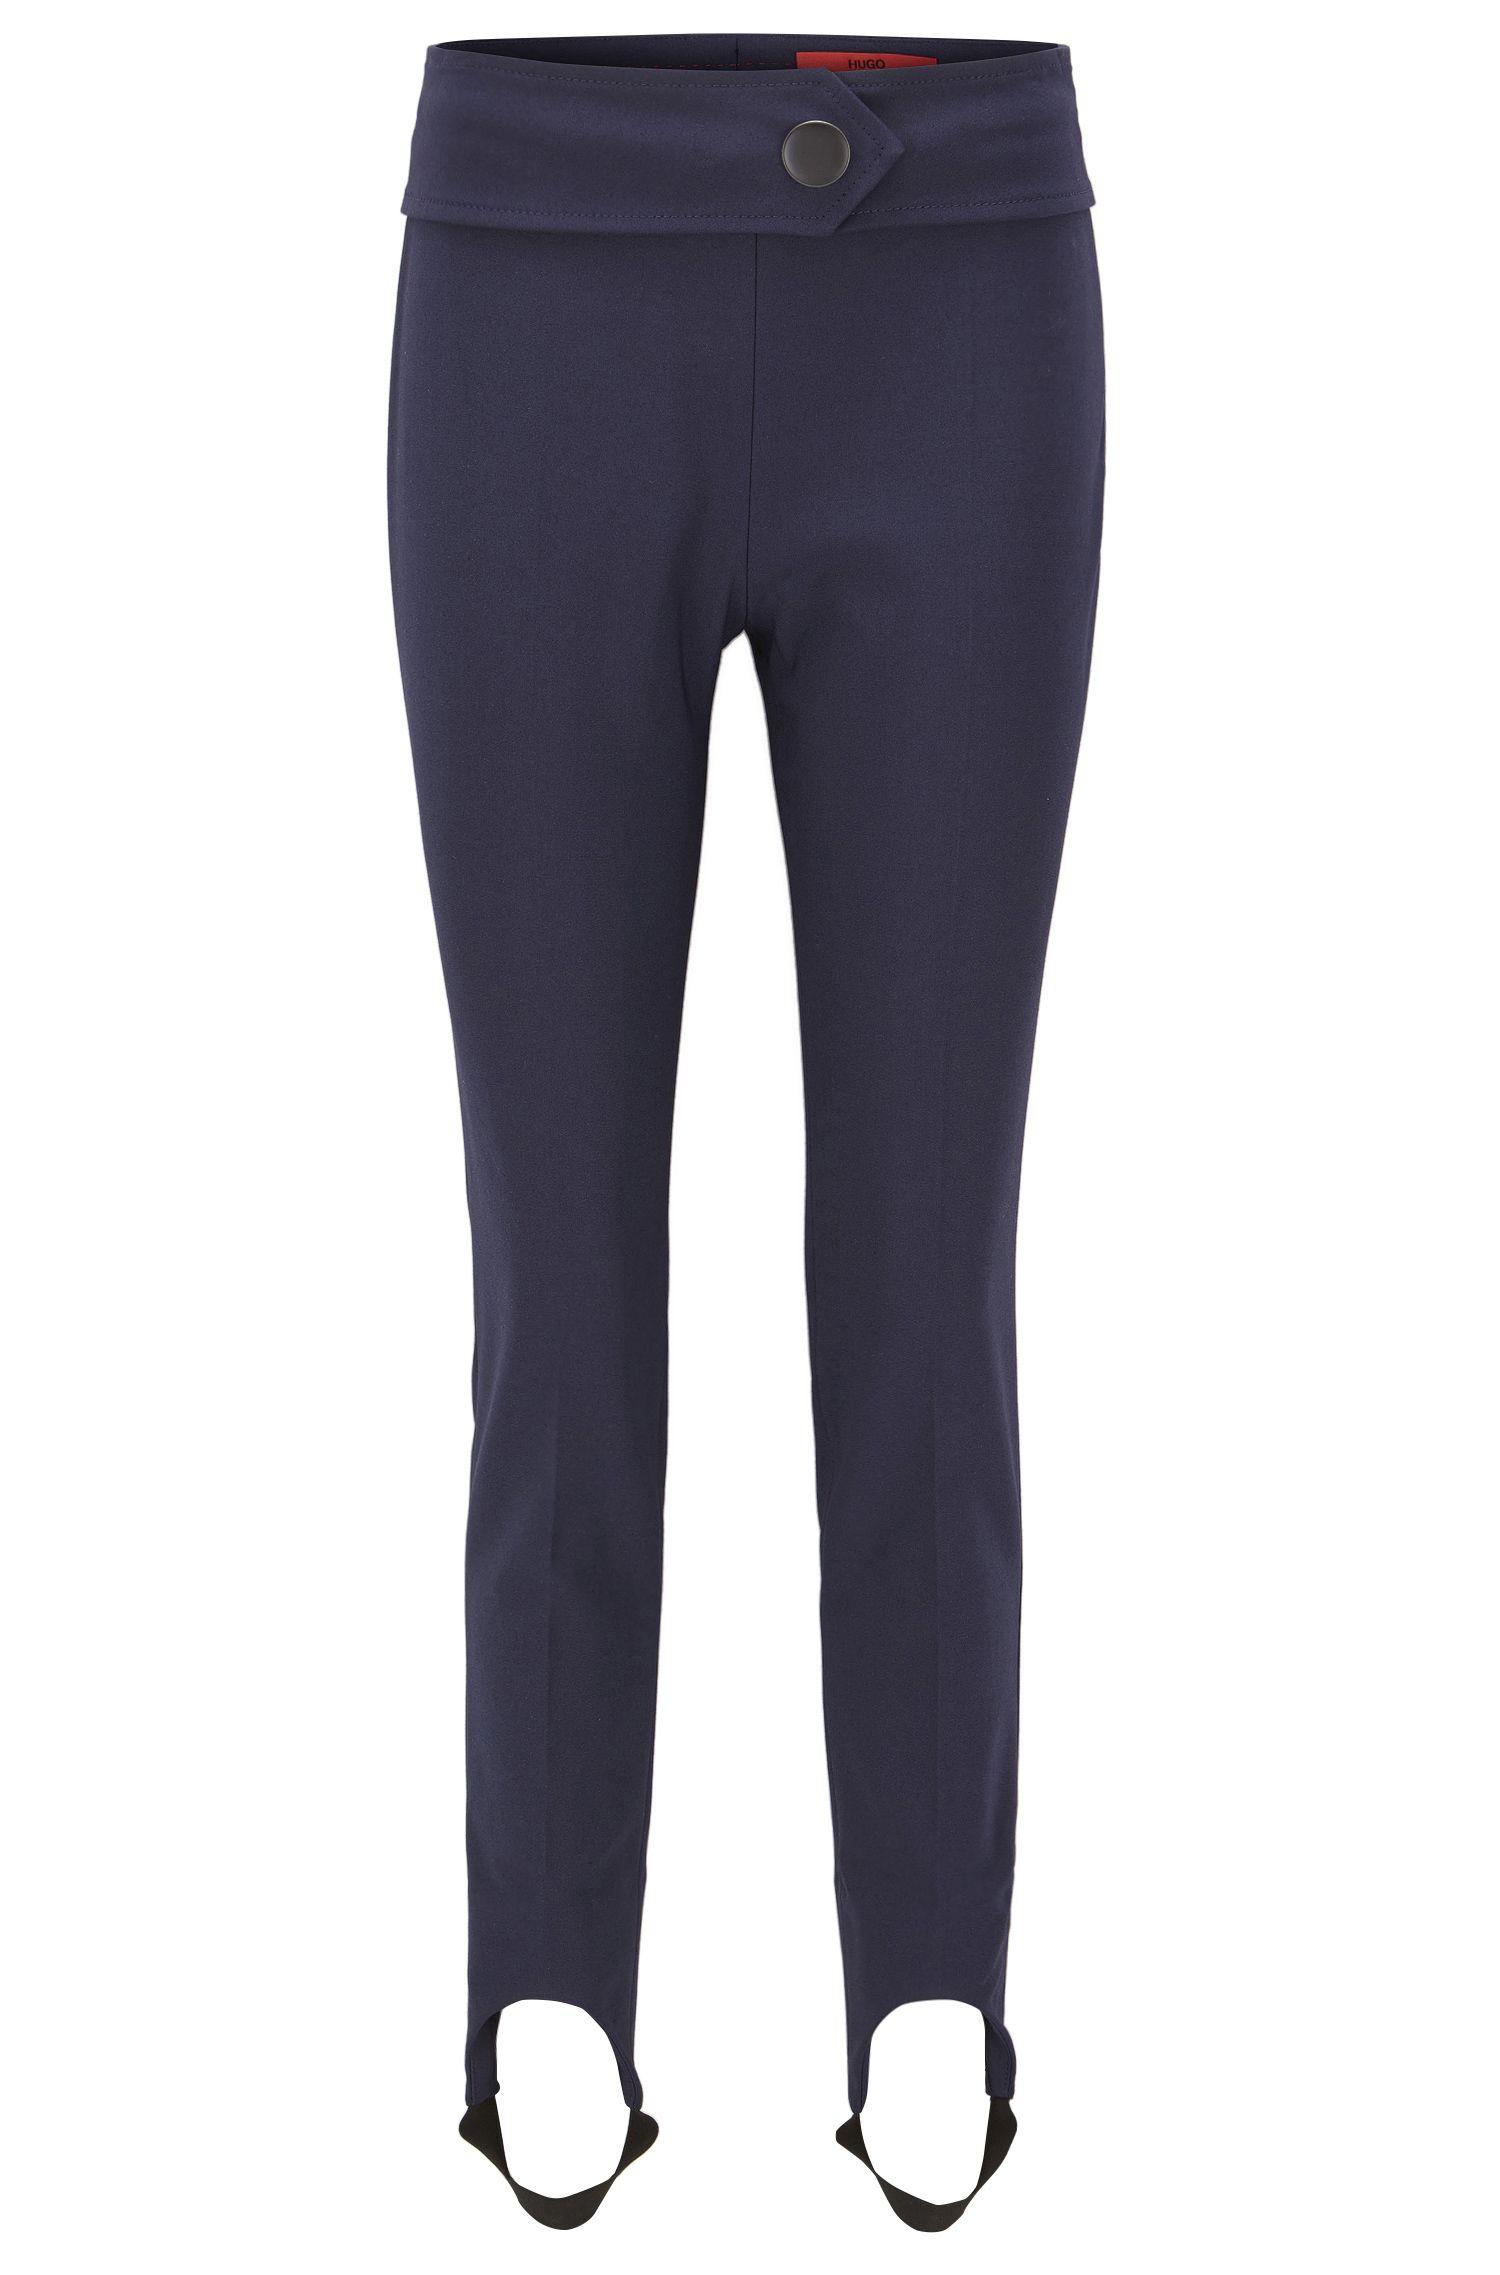 Skinny-fit stirrup trousers in a stretch cotton blend